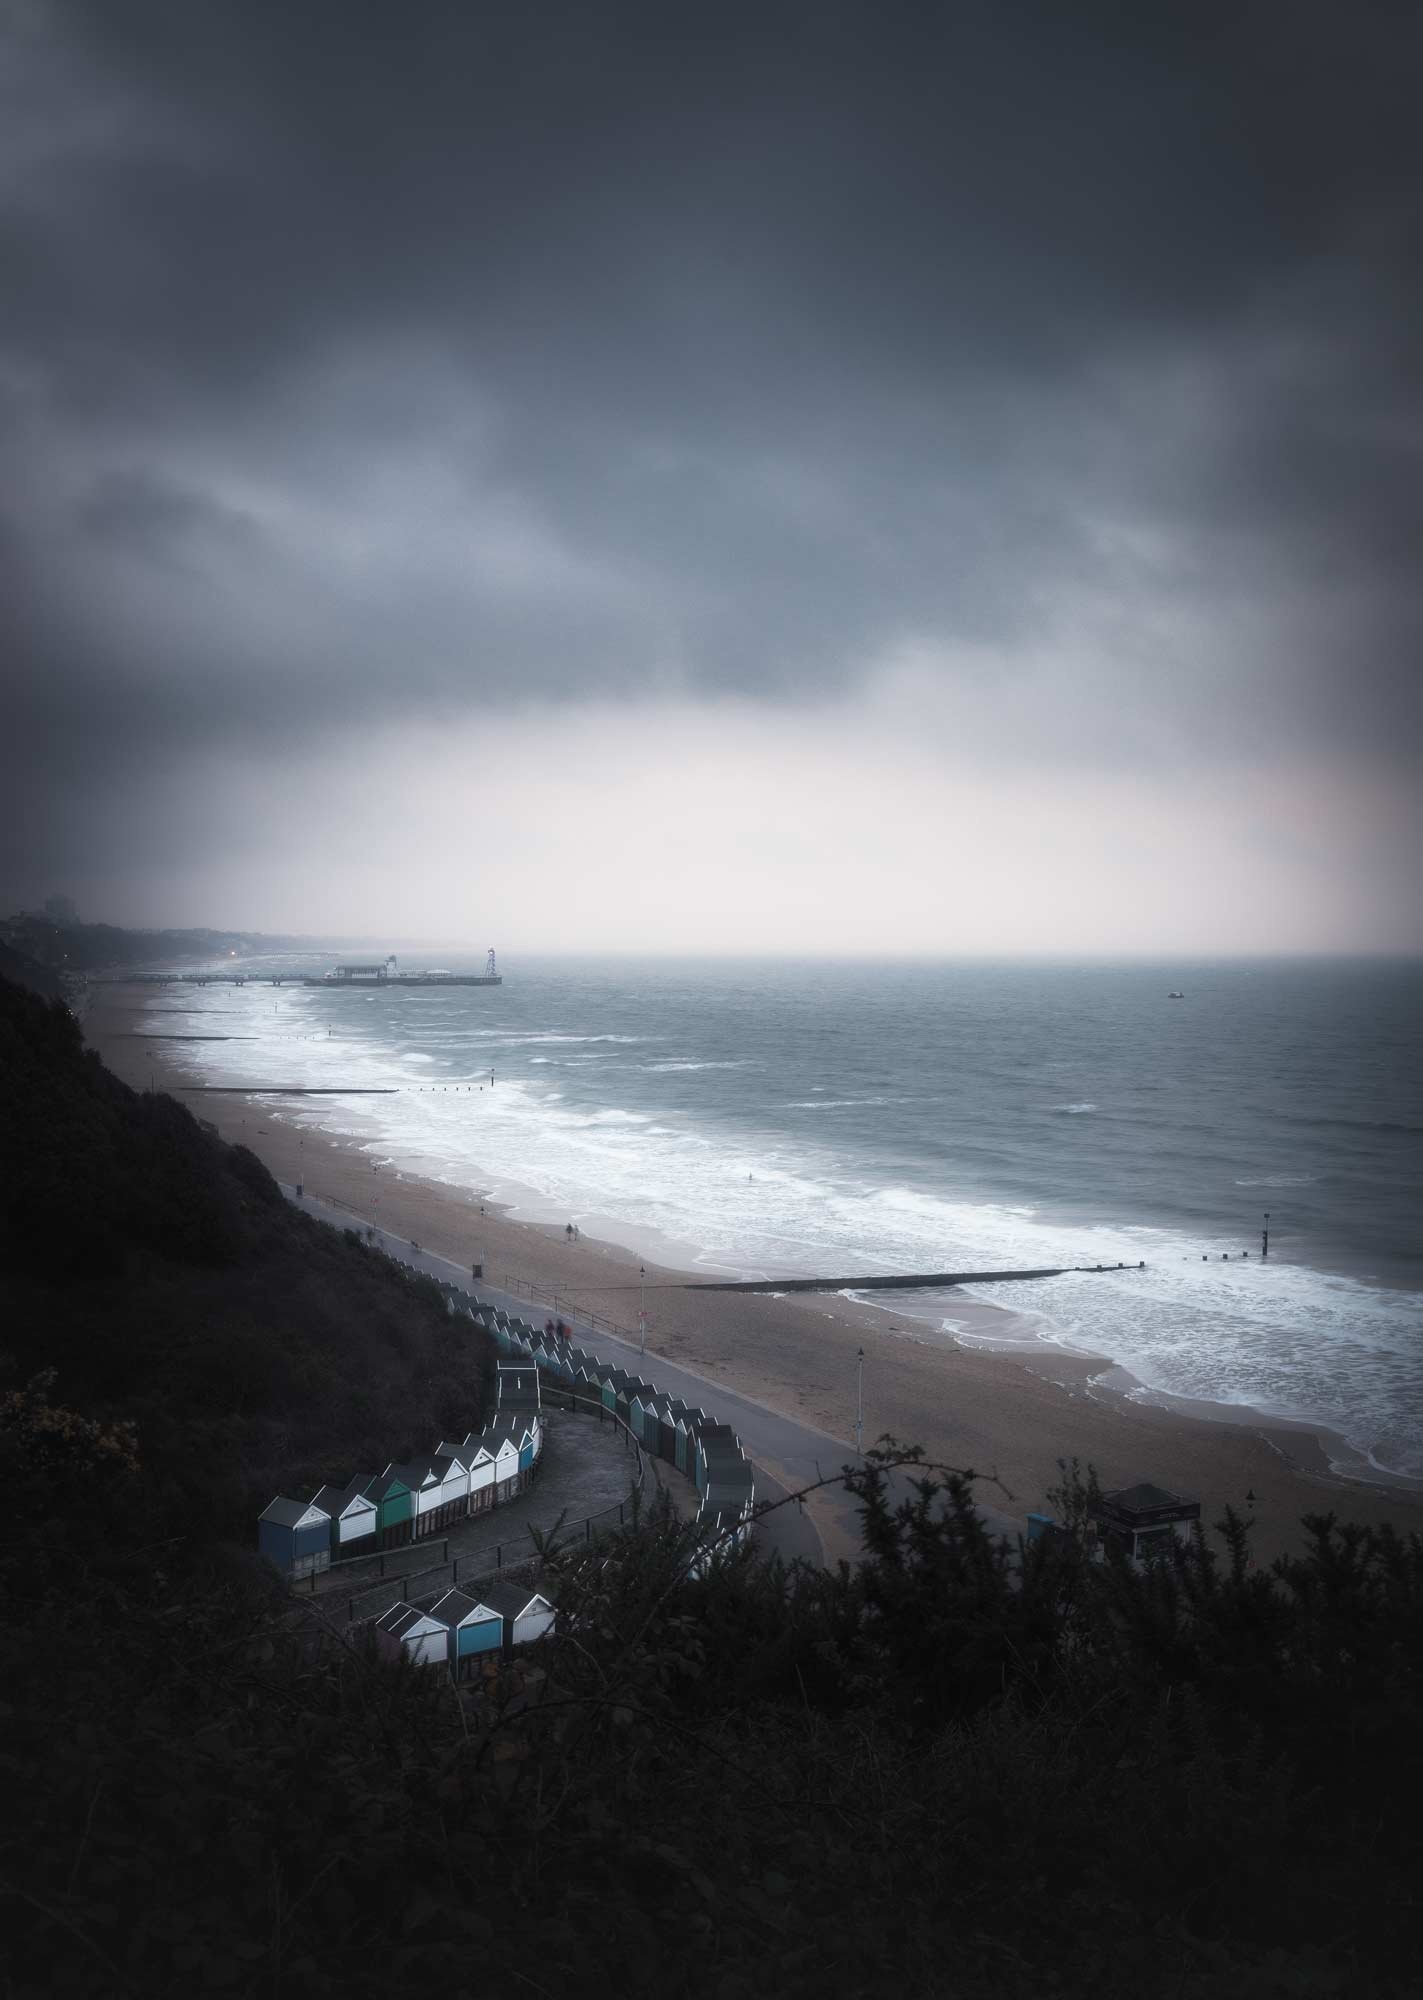 Bournemouth Beach - Stormy Morning